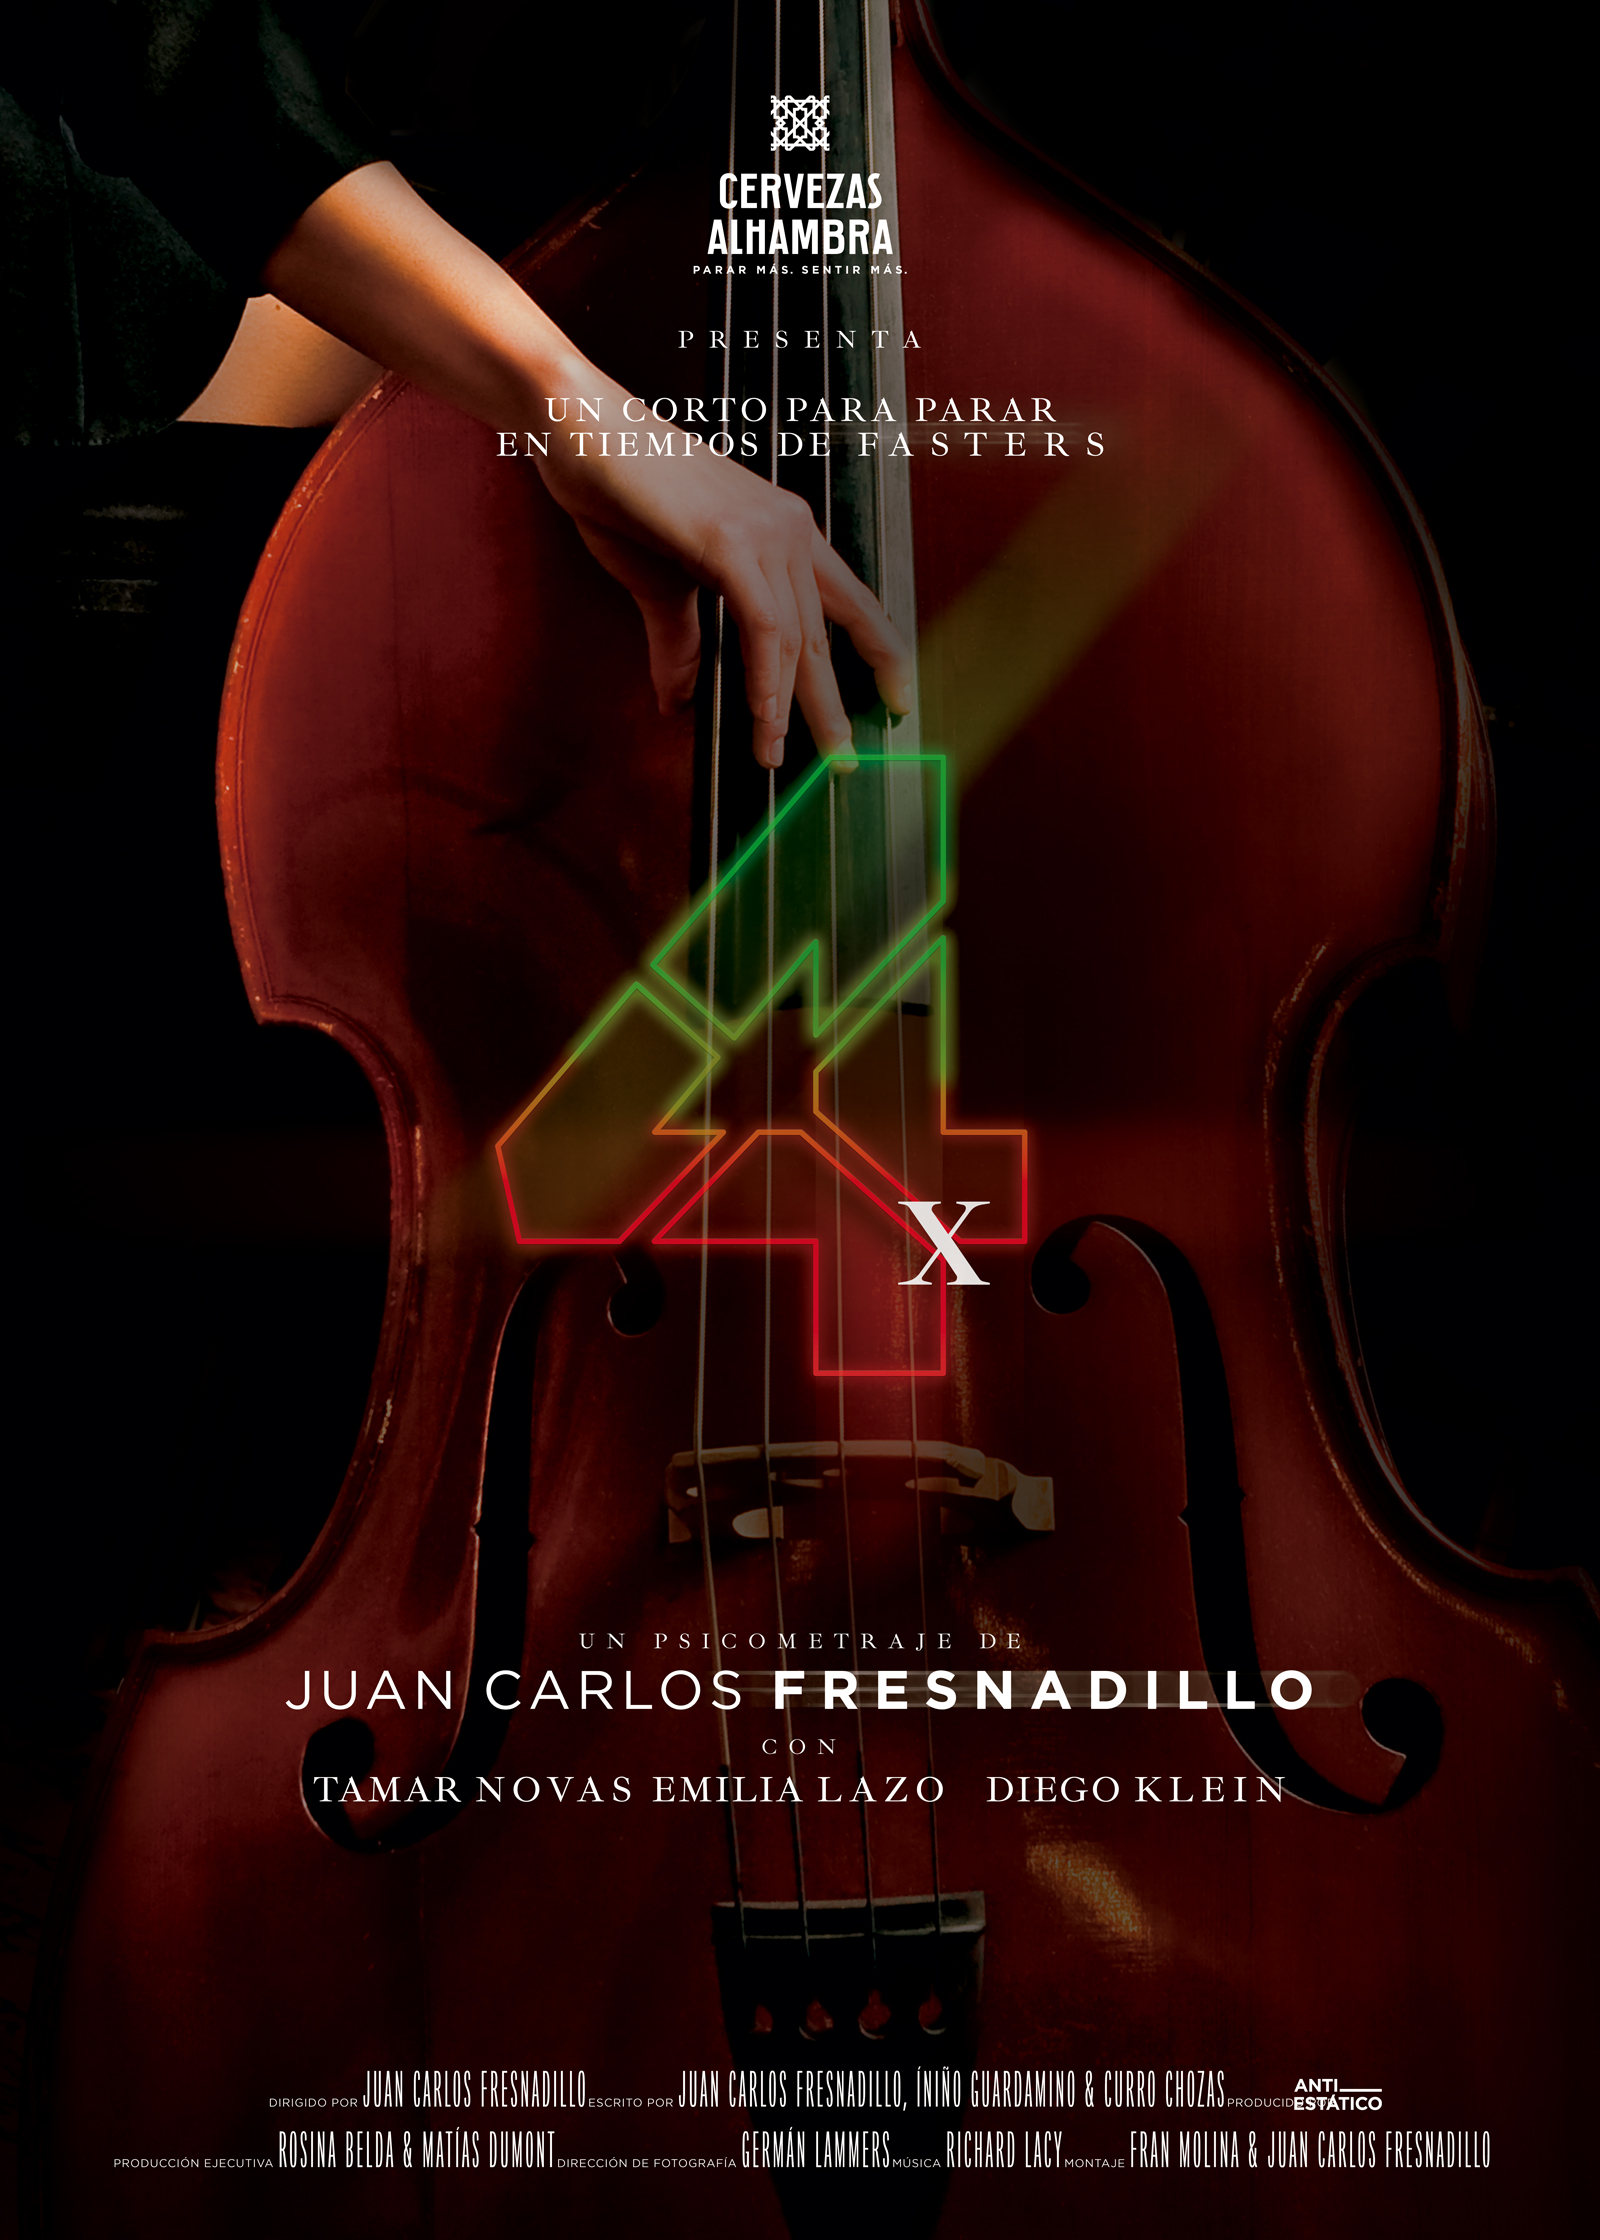 4x_Cinema_Poster_Juan_Carlos_Fresnadillo